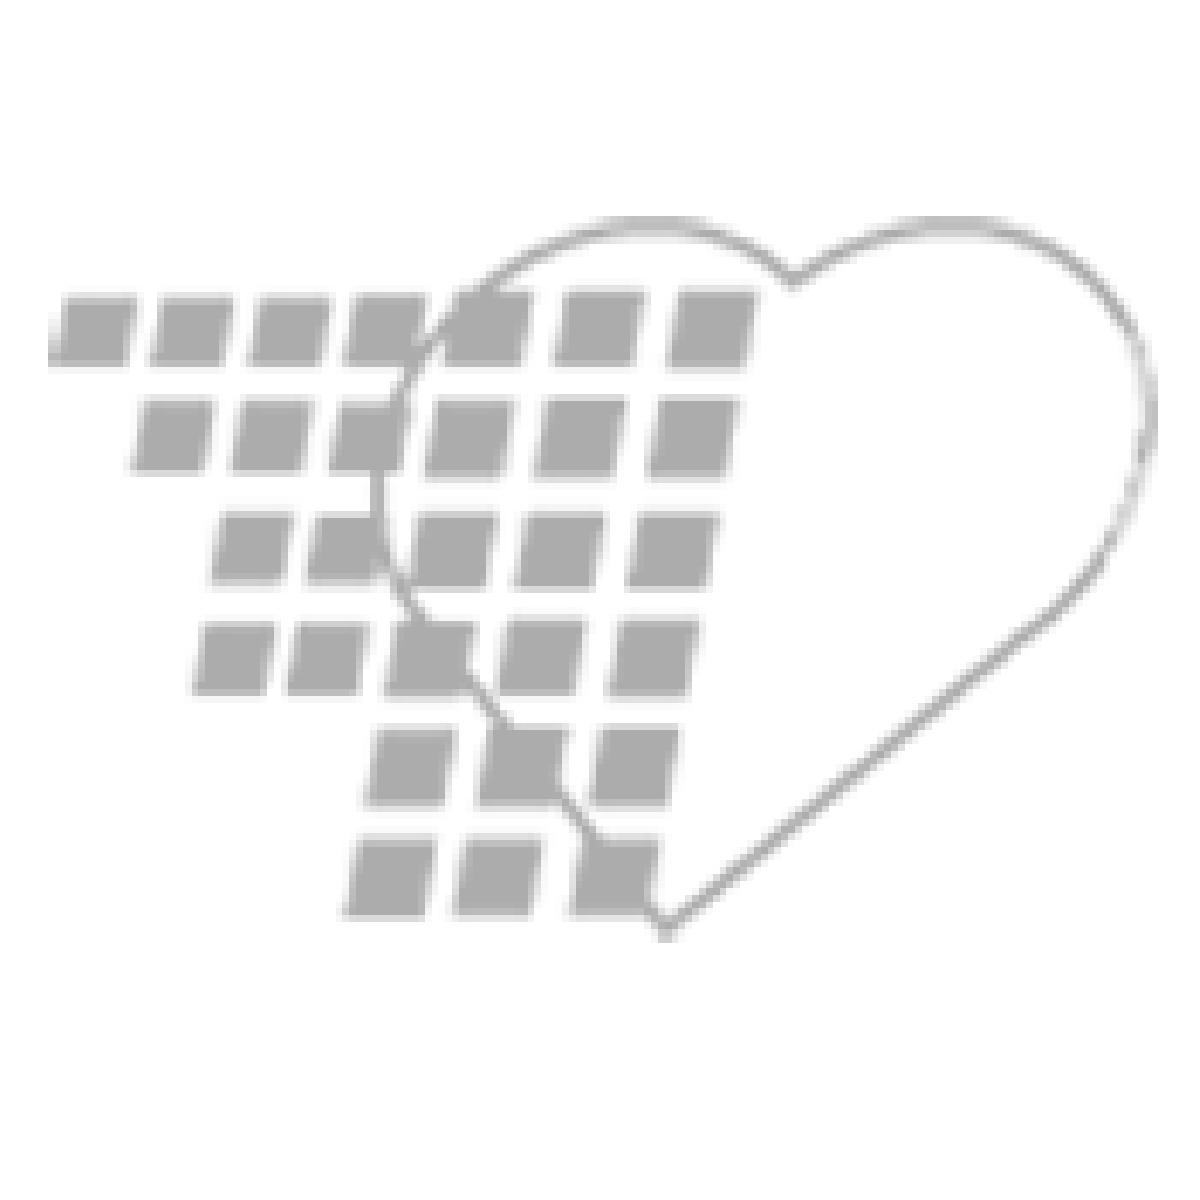 06-21-7856 BD™ Vacutainer® PLUS Plastic K2EDTA Whole Blood Tube - 3 mL Draw with Lavender BD Hemogard™ Closure